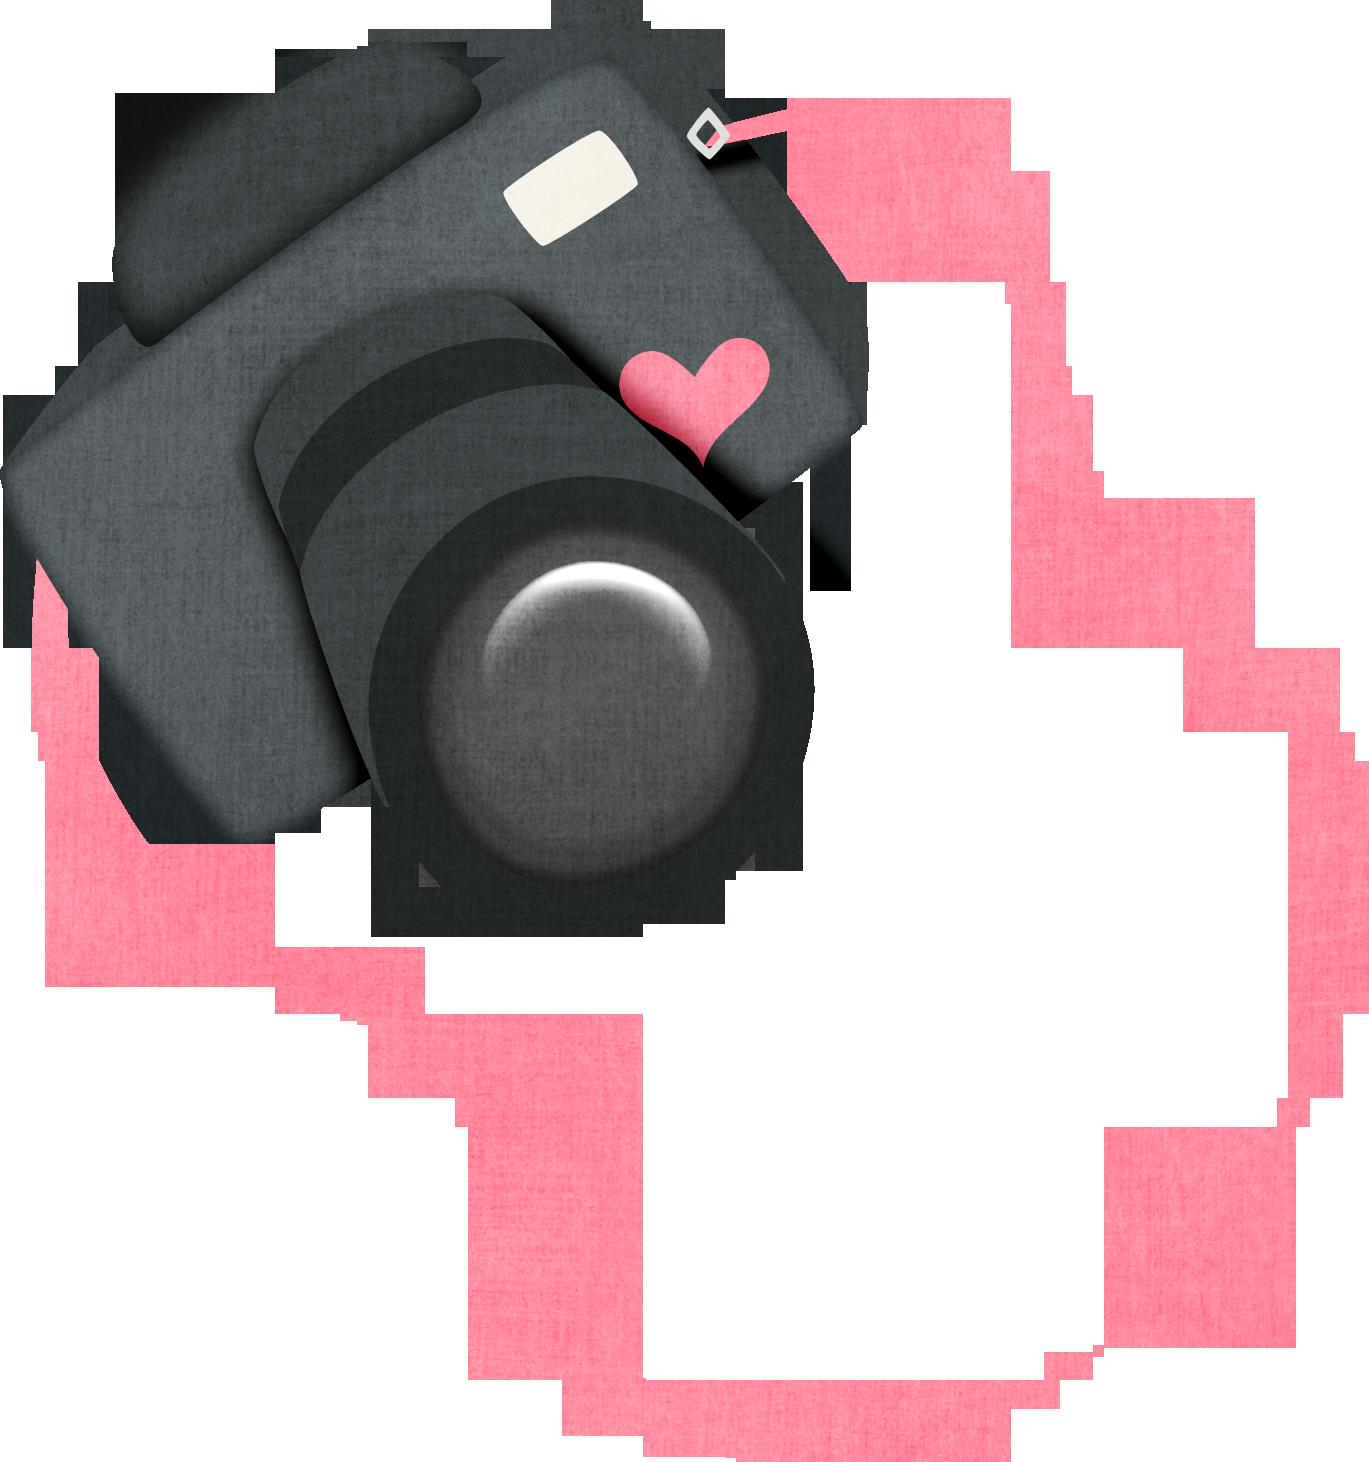 Pin by borboletasbyceci on. Scrapbook clipart camera